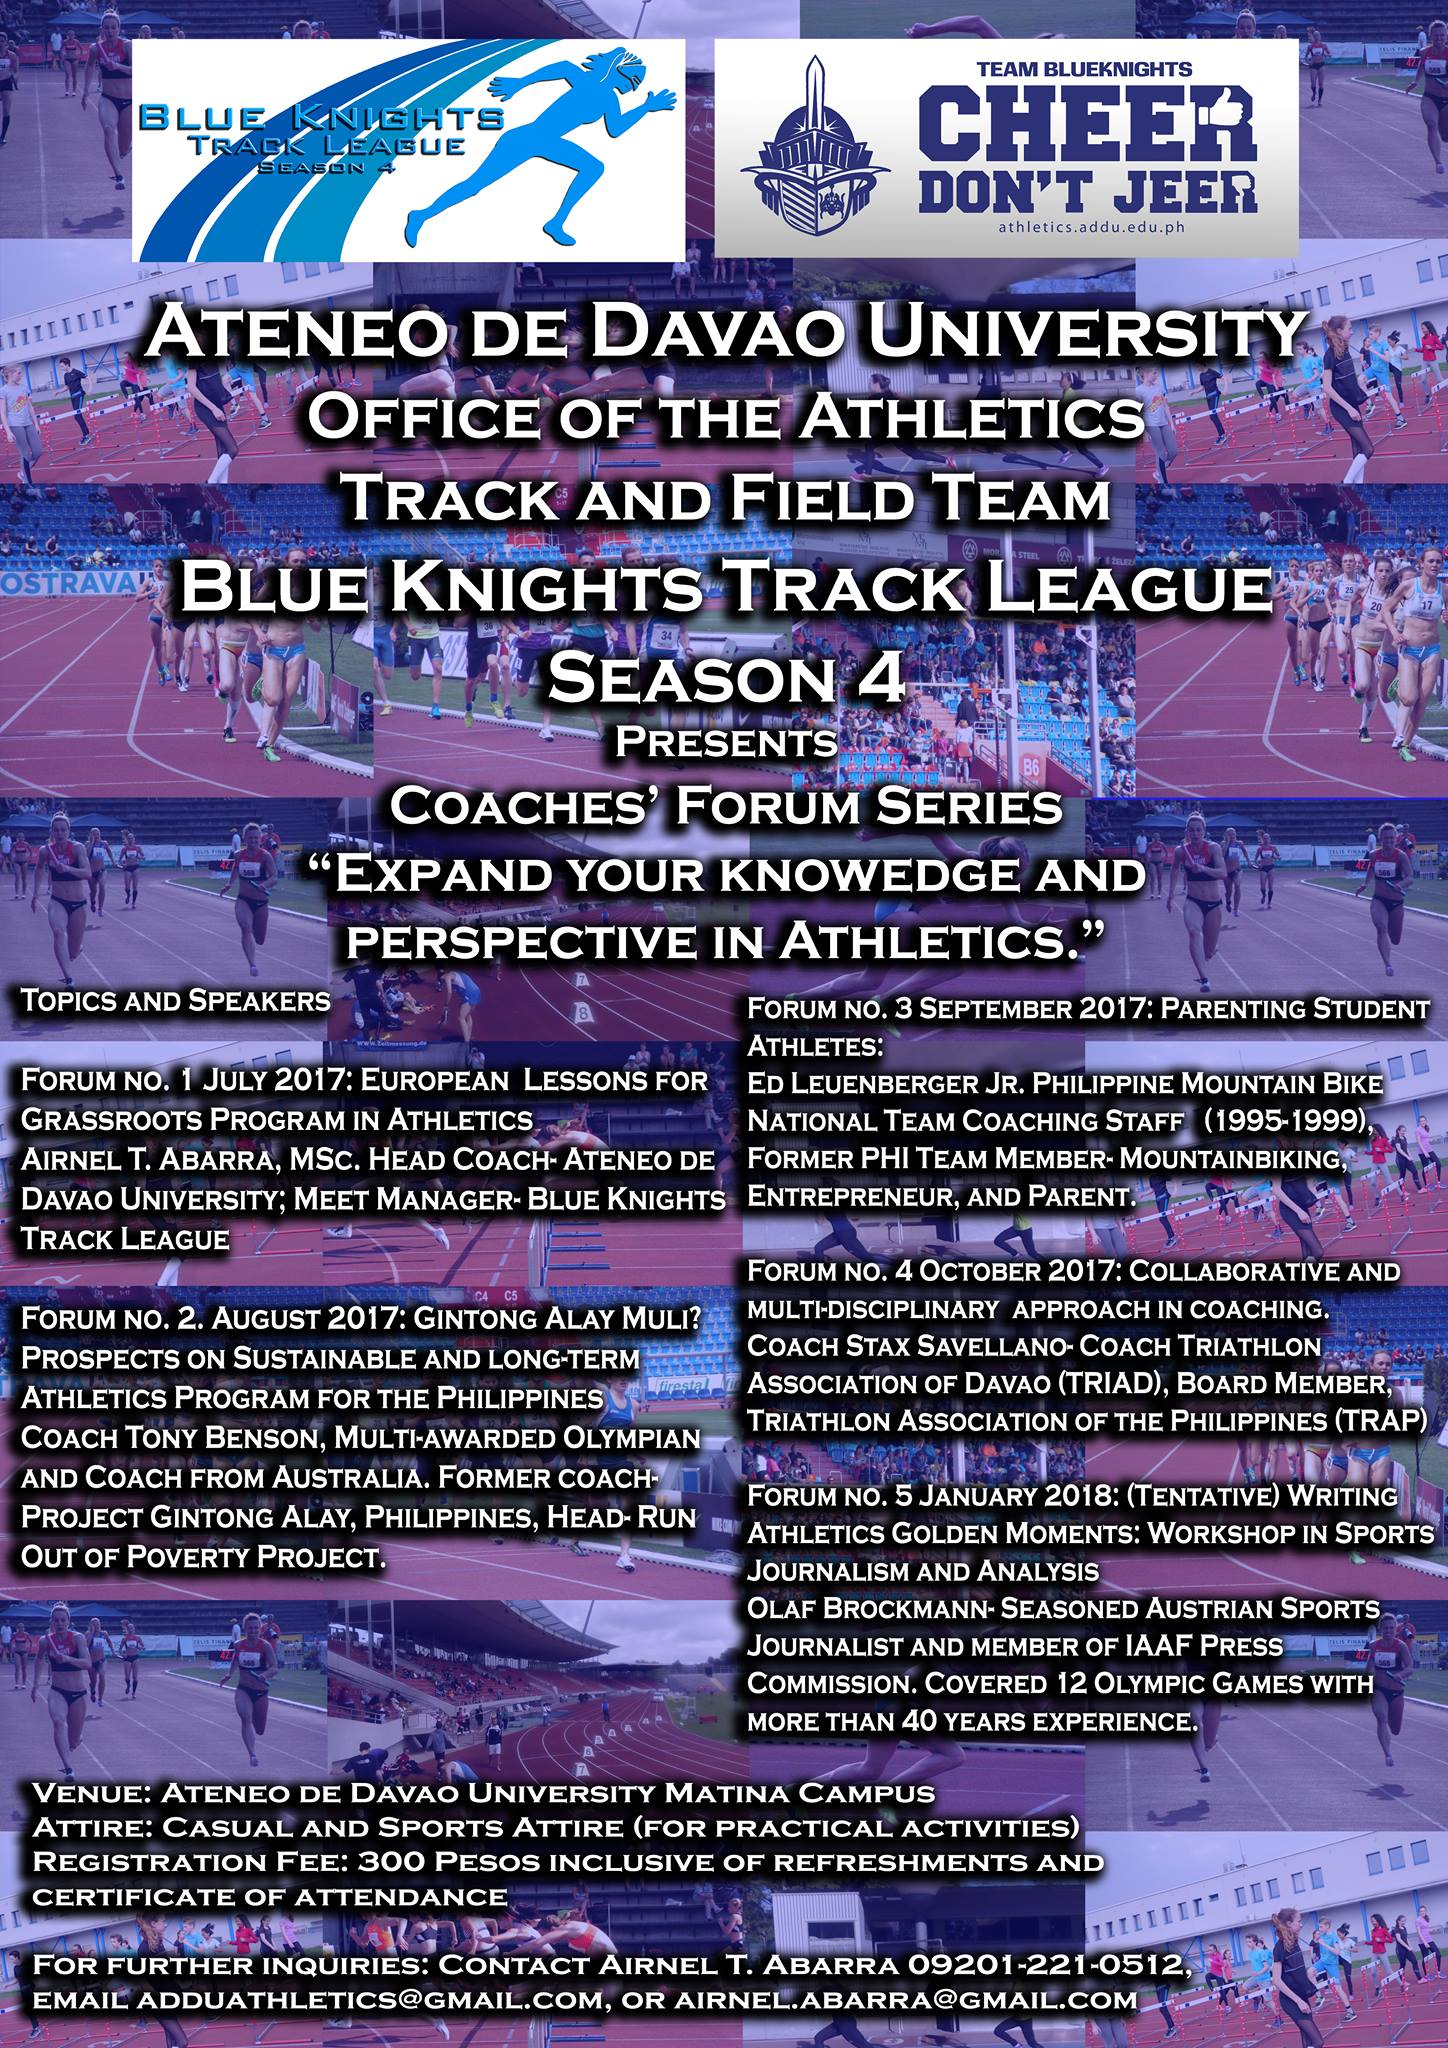 Blue Knights Track League Season 4 Coaches Forum